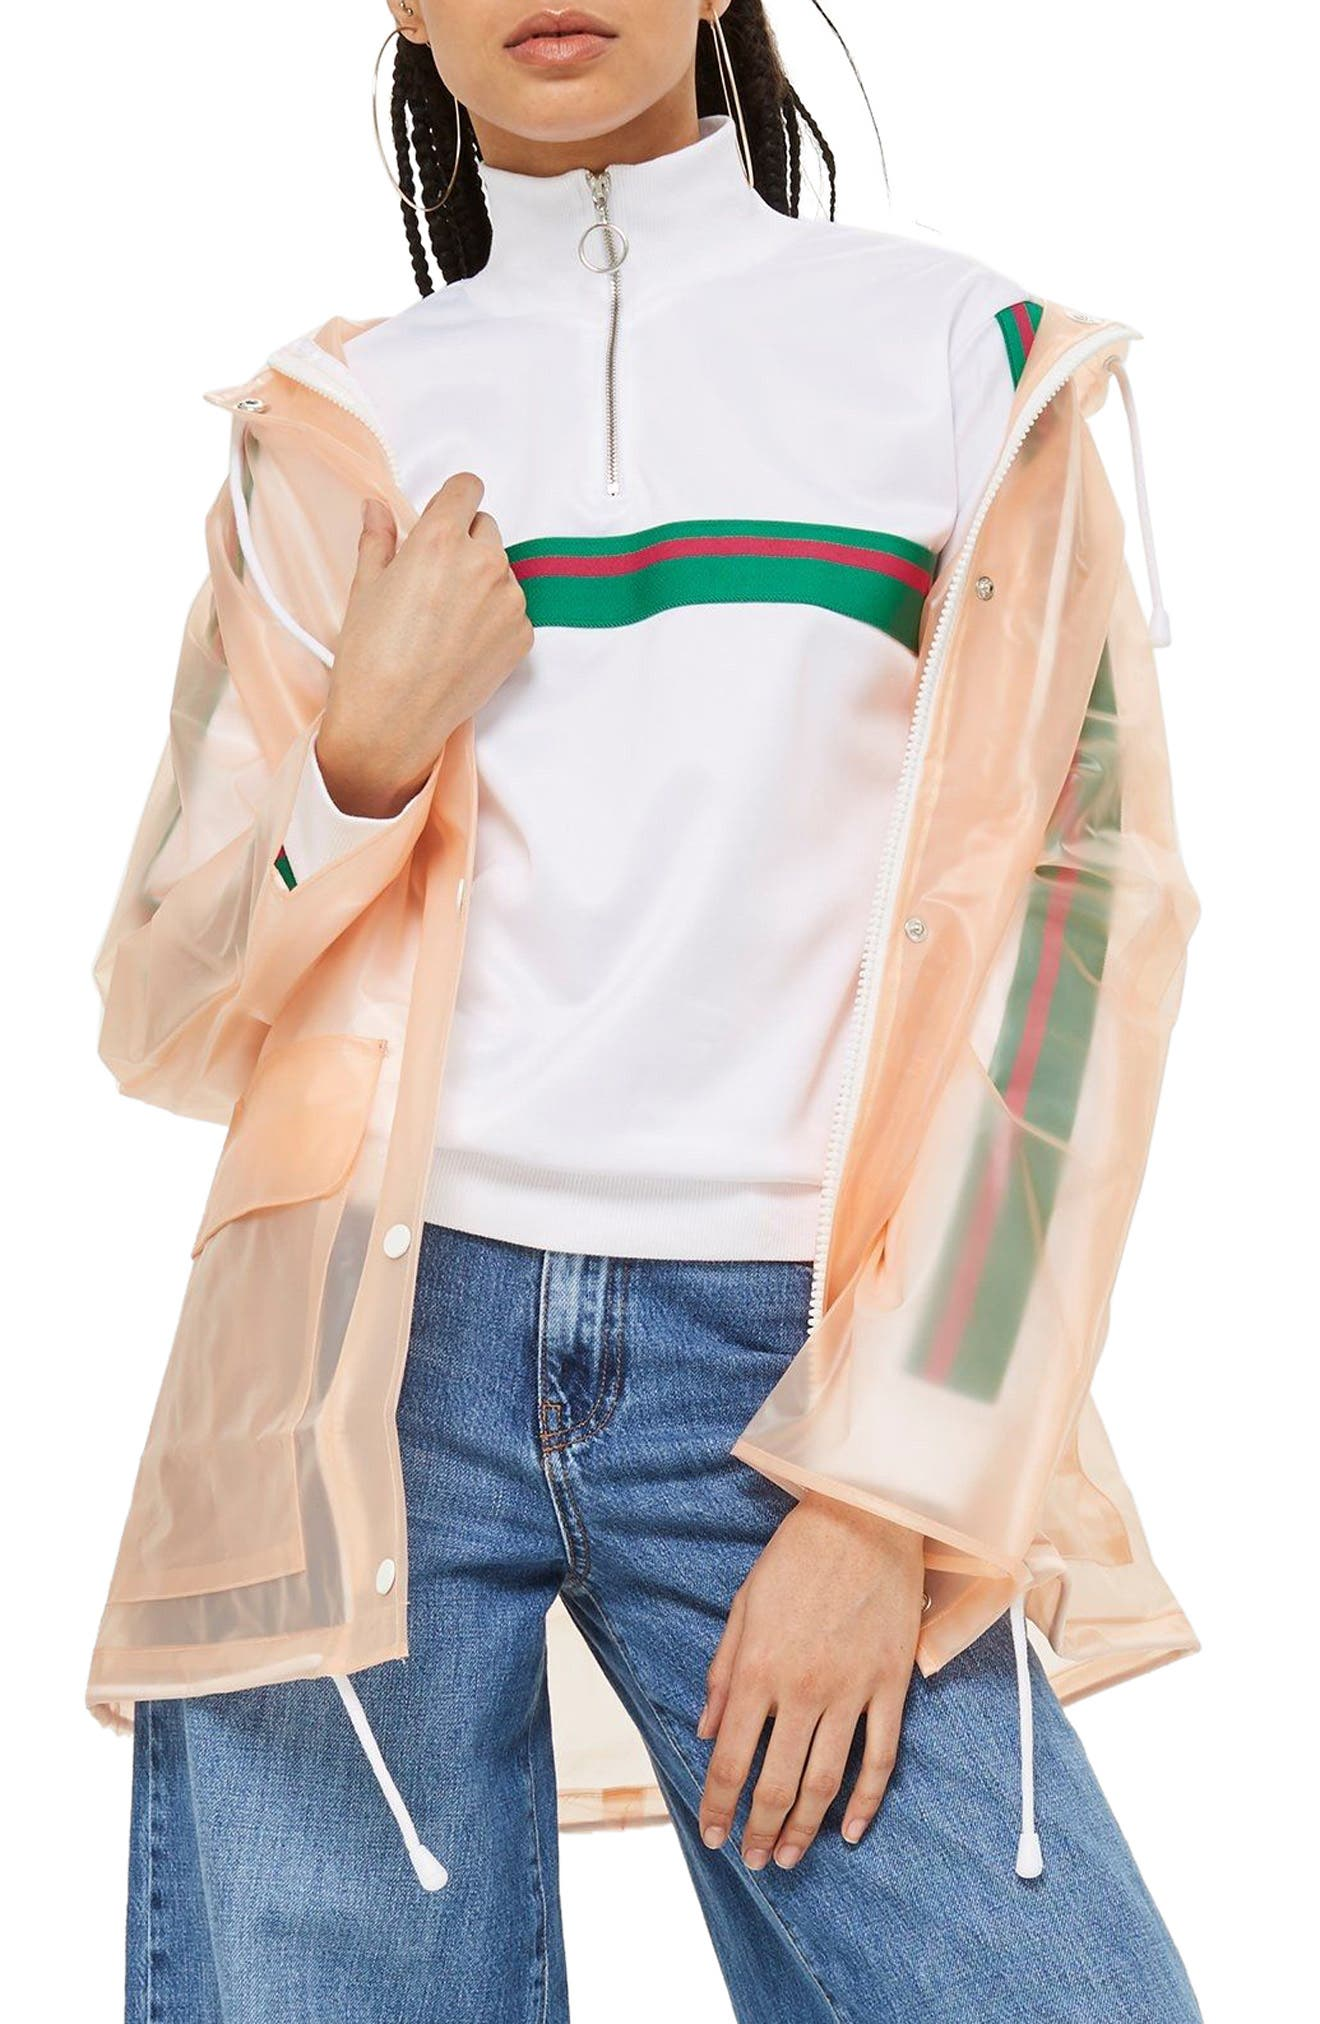 Frosted Marge Mac Rain Jacket,                             Main thumbnail 1, color,                             Peach Multi